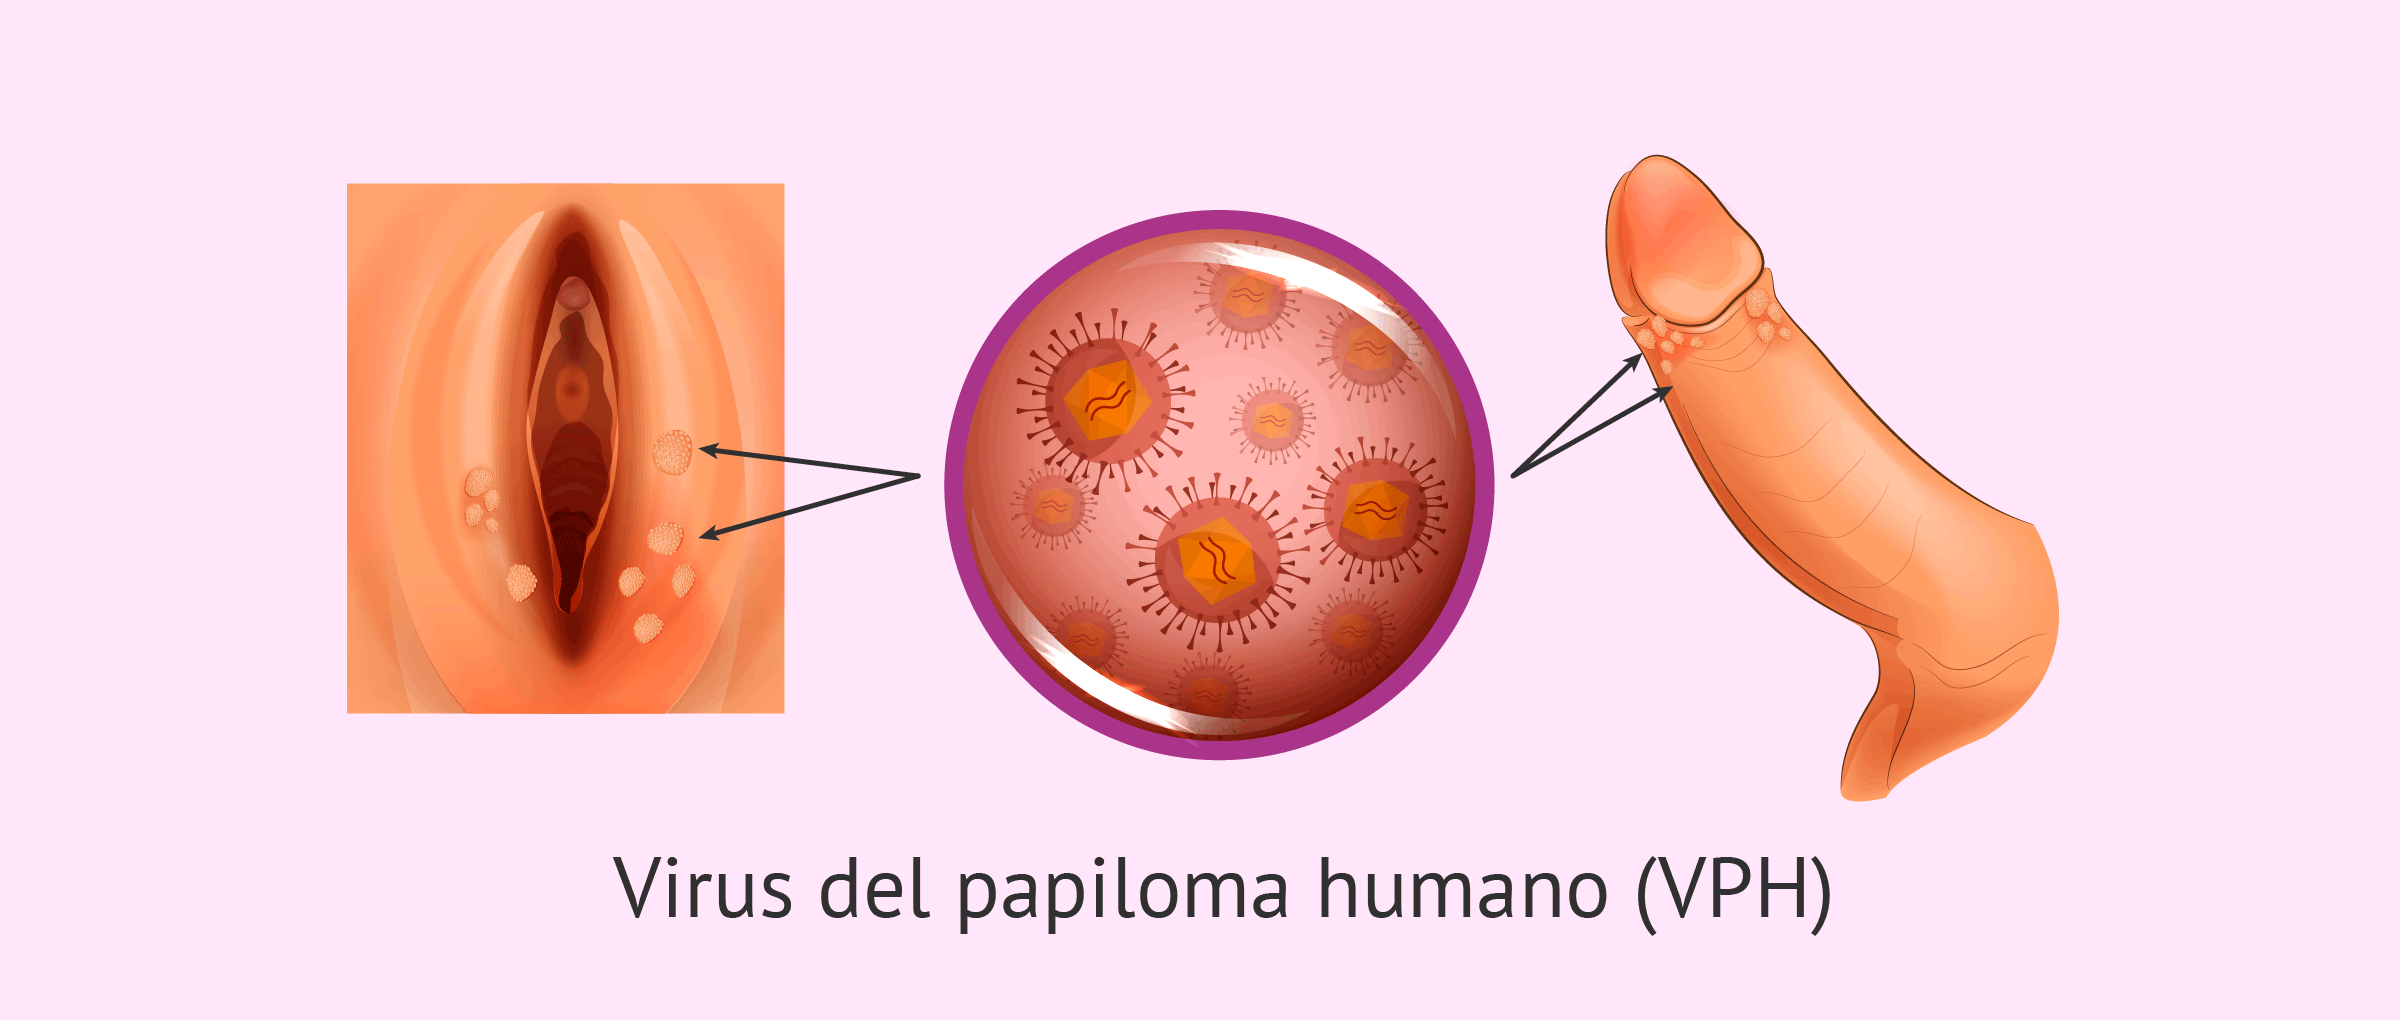 papiloma humano ke es